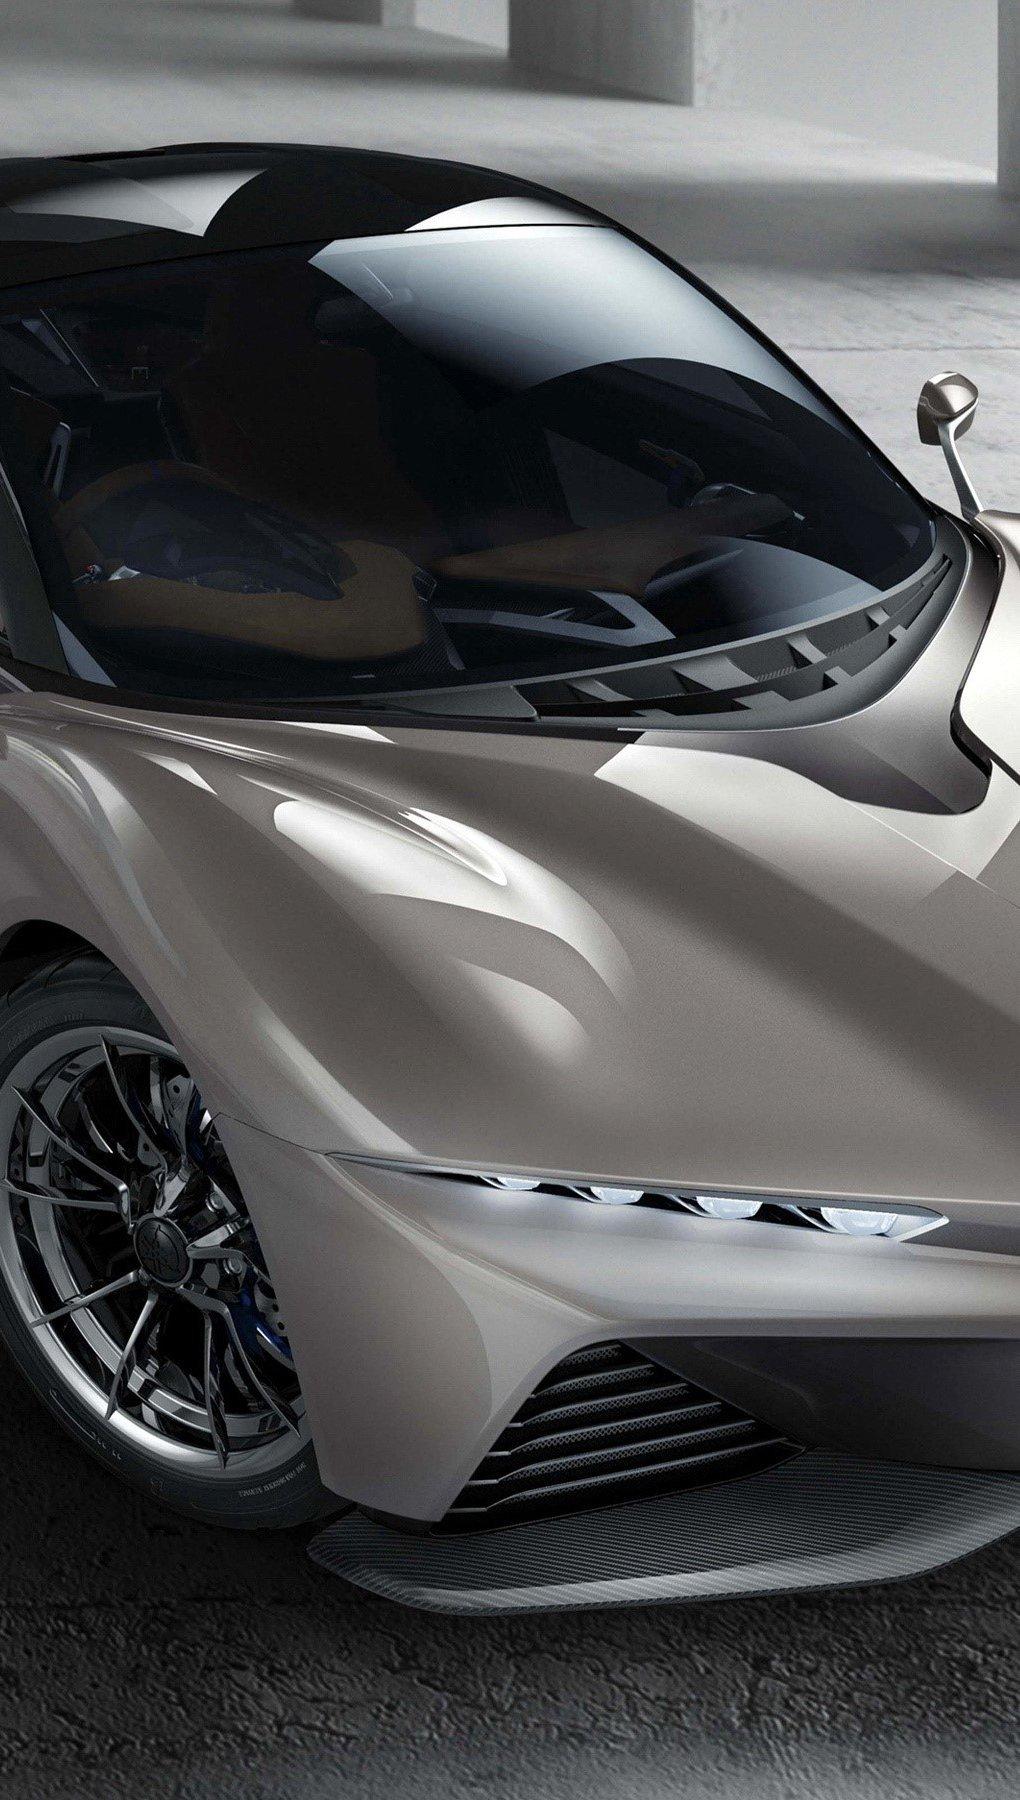 Wallpaper Yamaha Sports Ride Concept gray Vertical